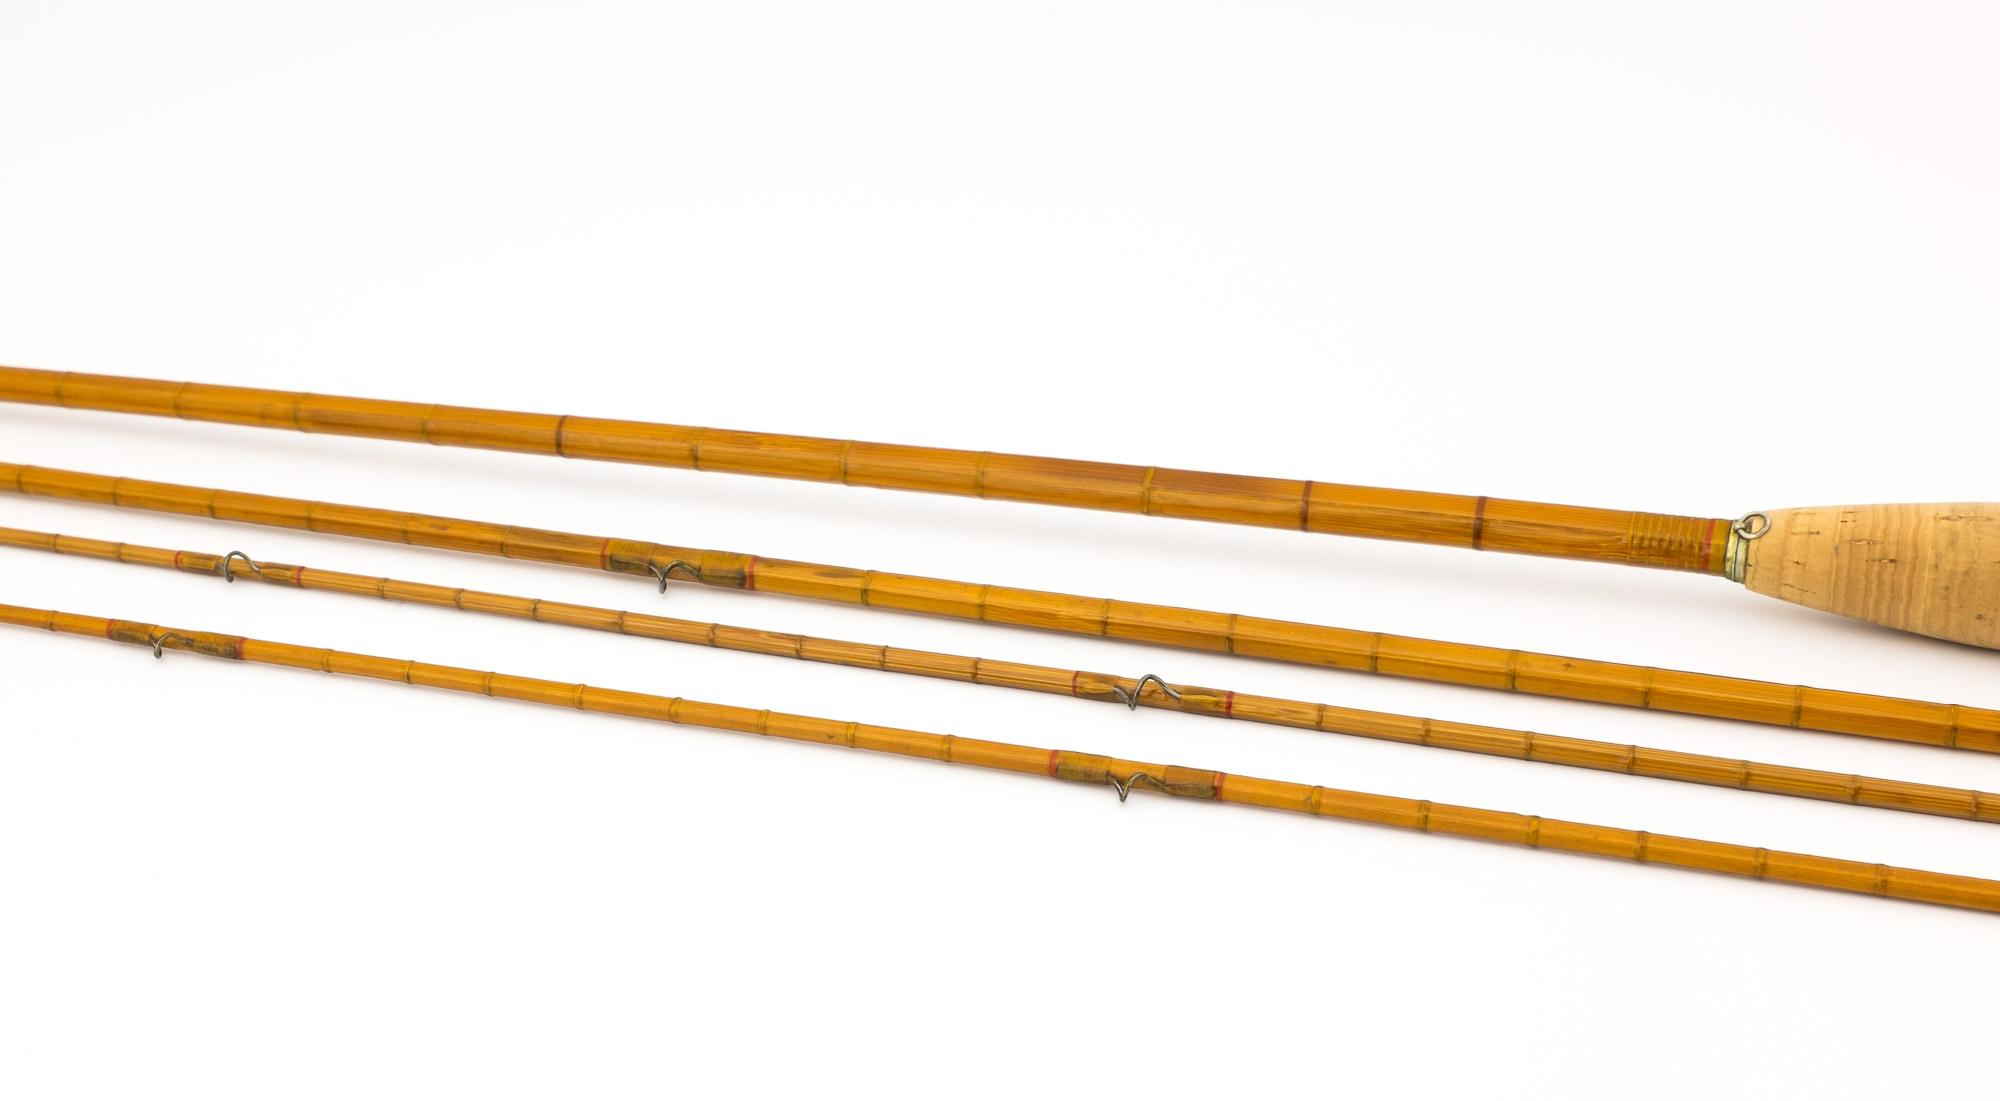 F.E.ThomasSpecial-4